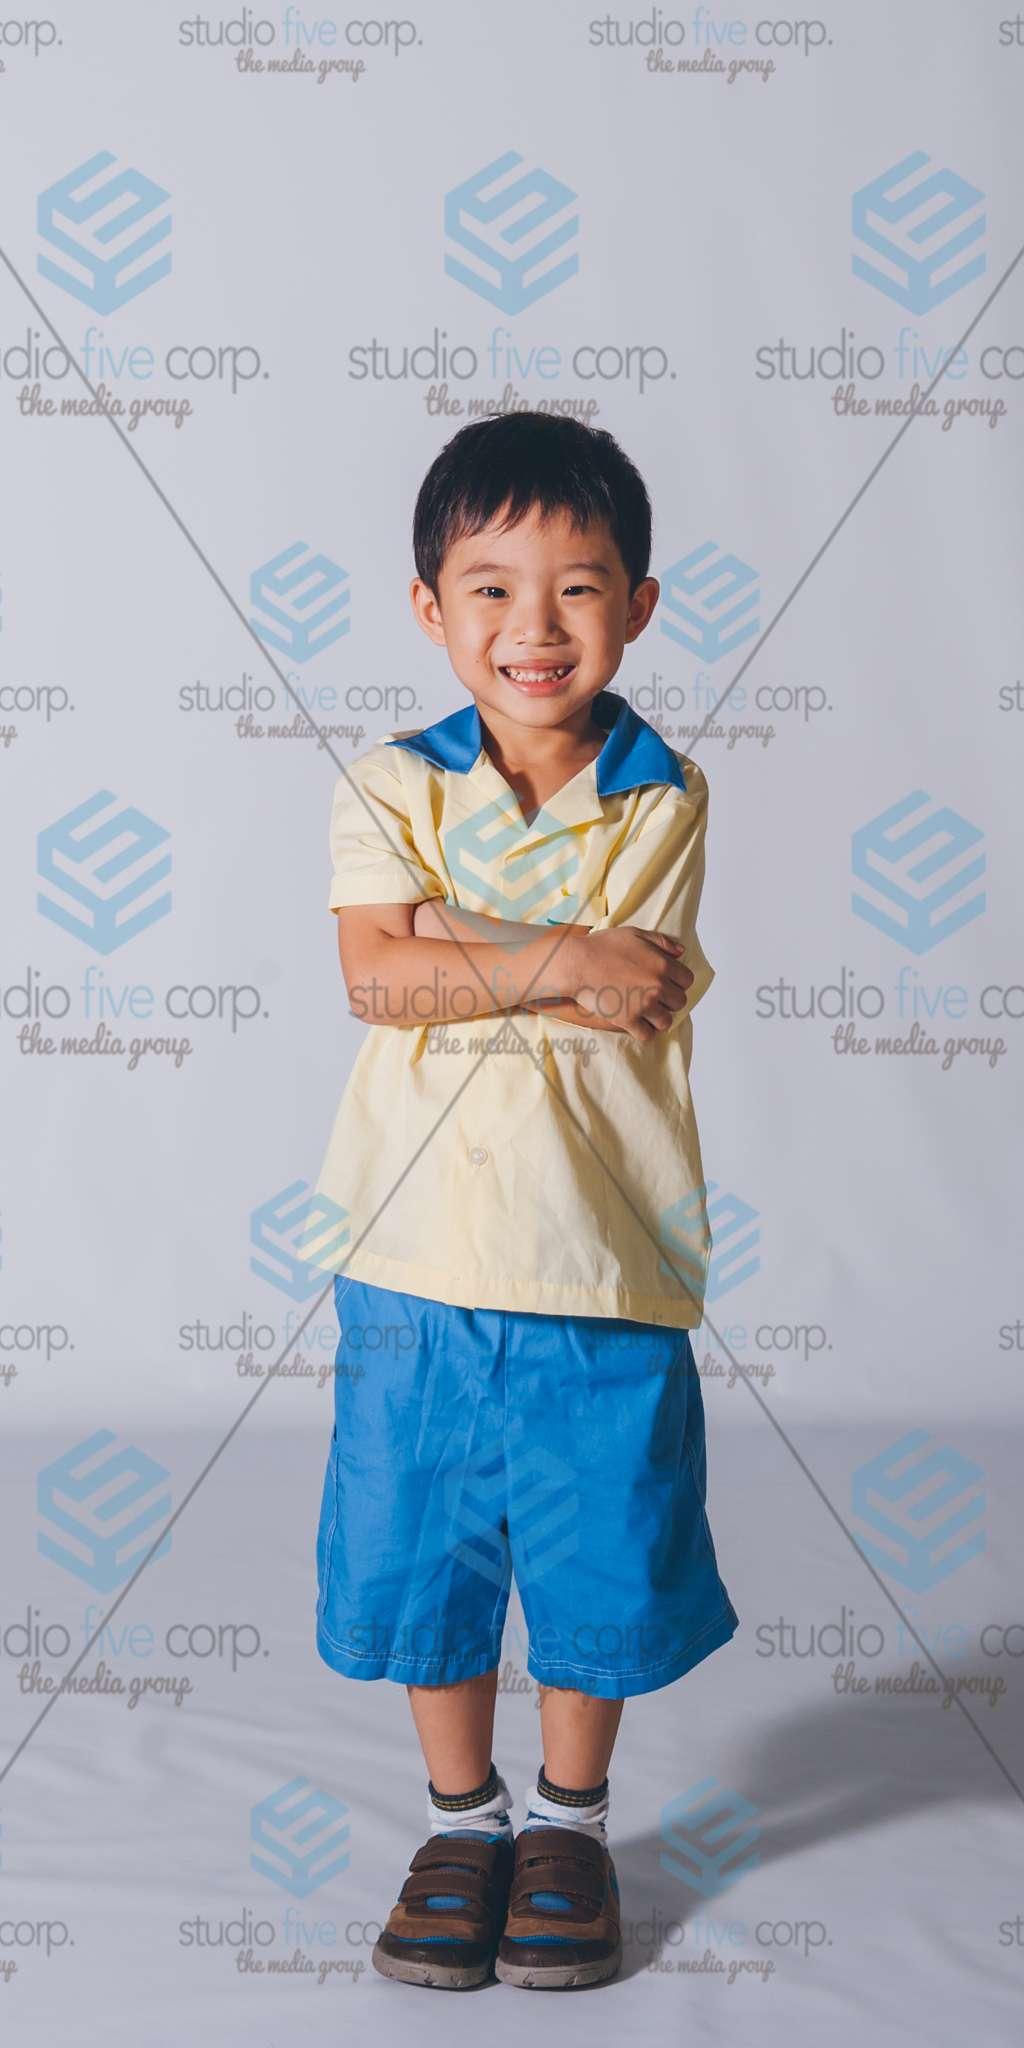 Joshua Cai Yu Yang